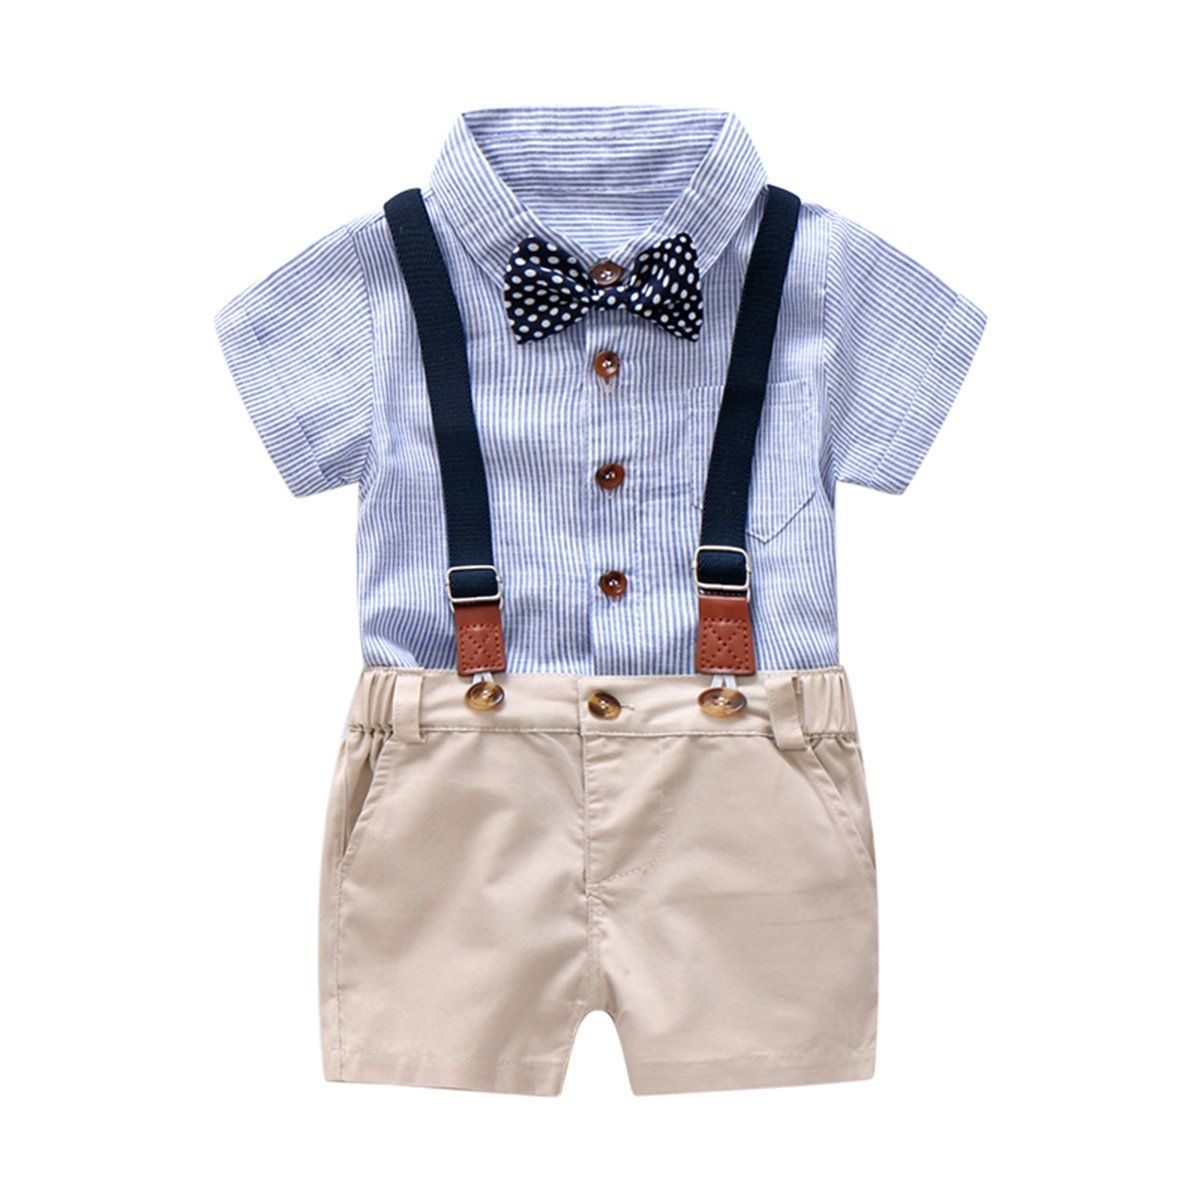 Gray, 6 Month Newborn Kids Boys Summer Bowtie Short Sleeve Shirt+Suspenders Shorts Set